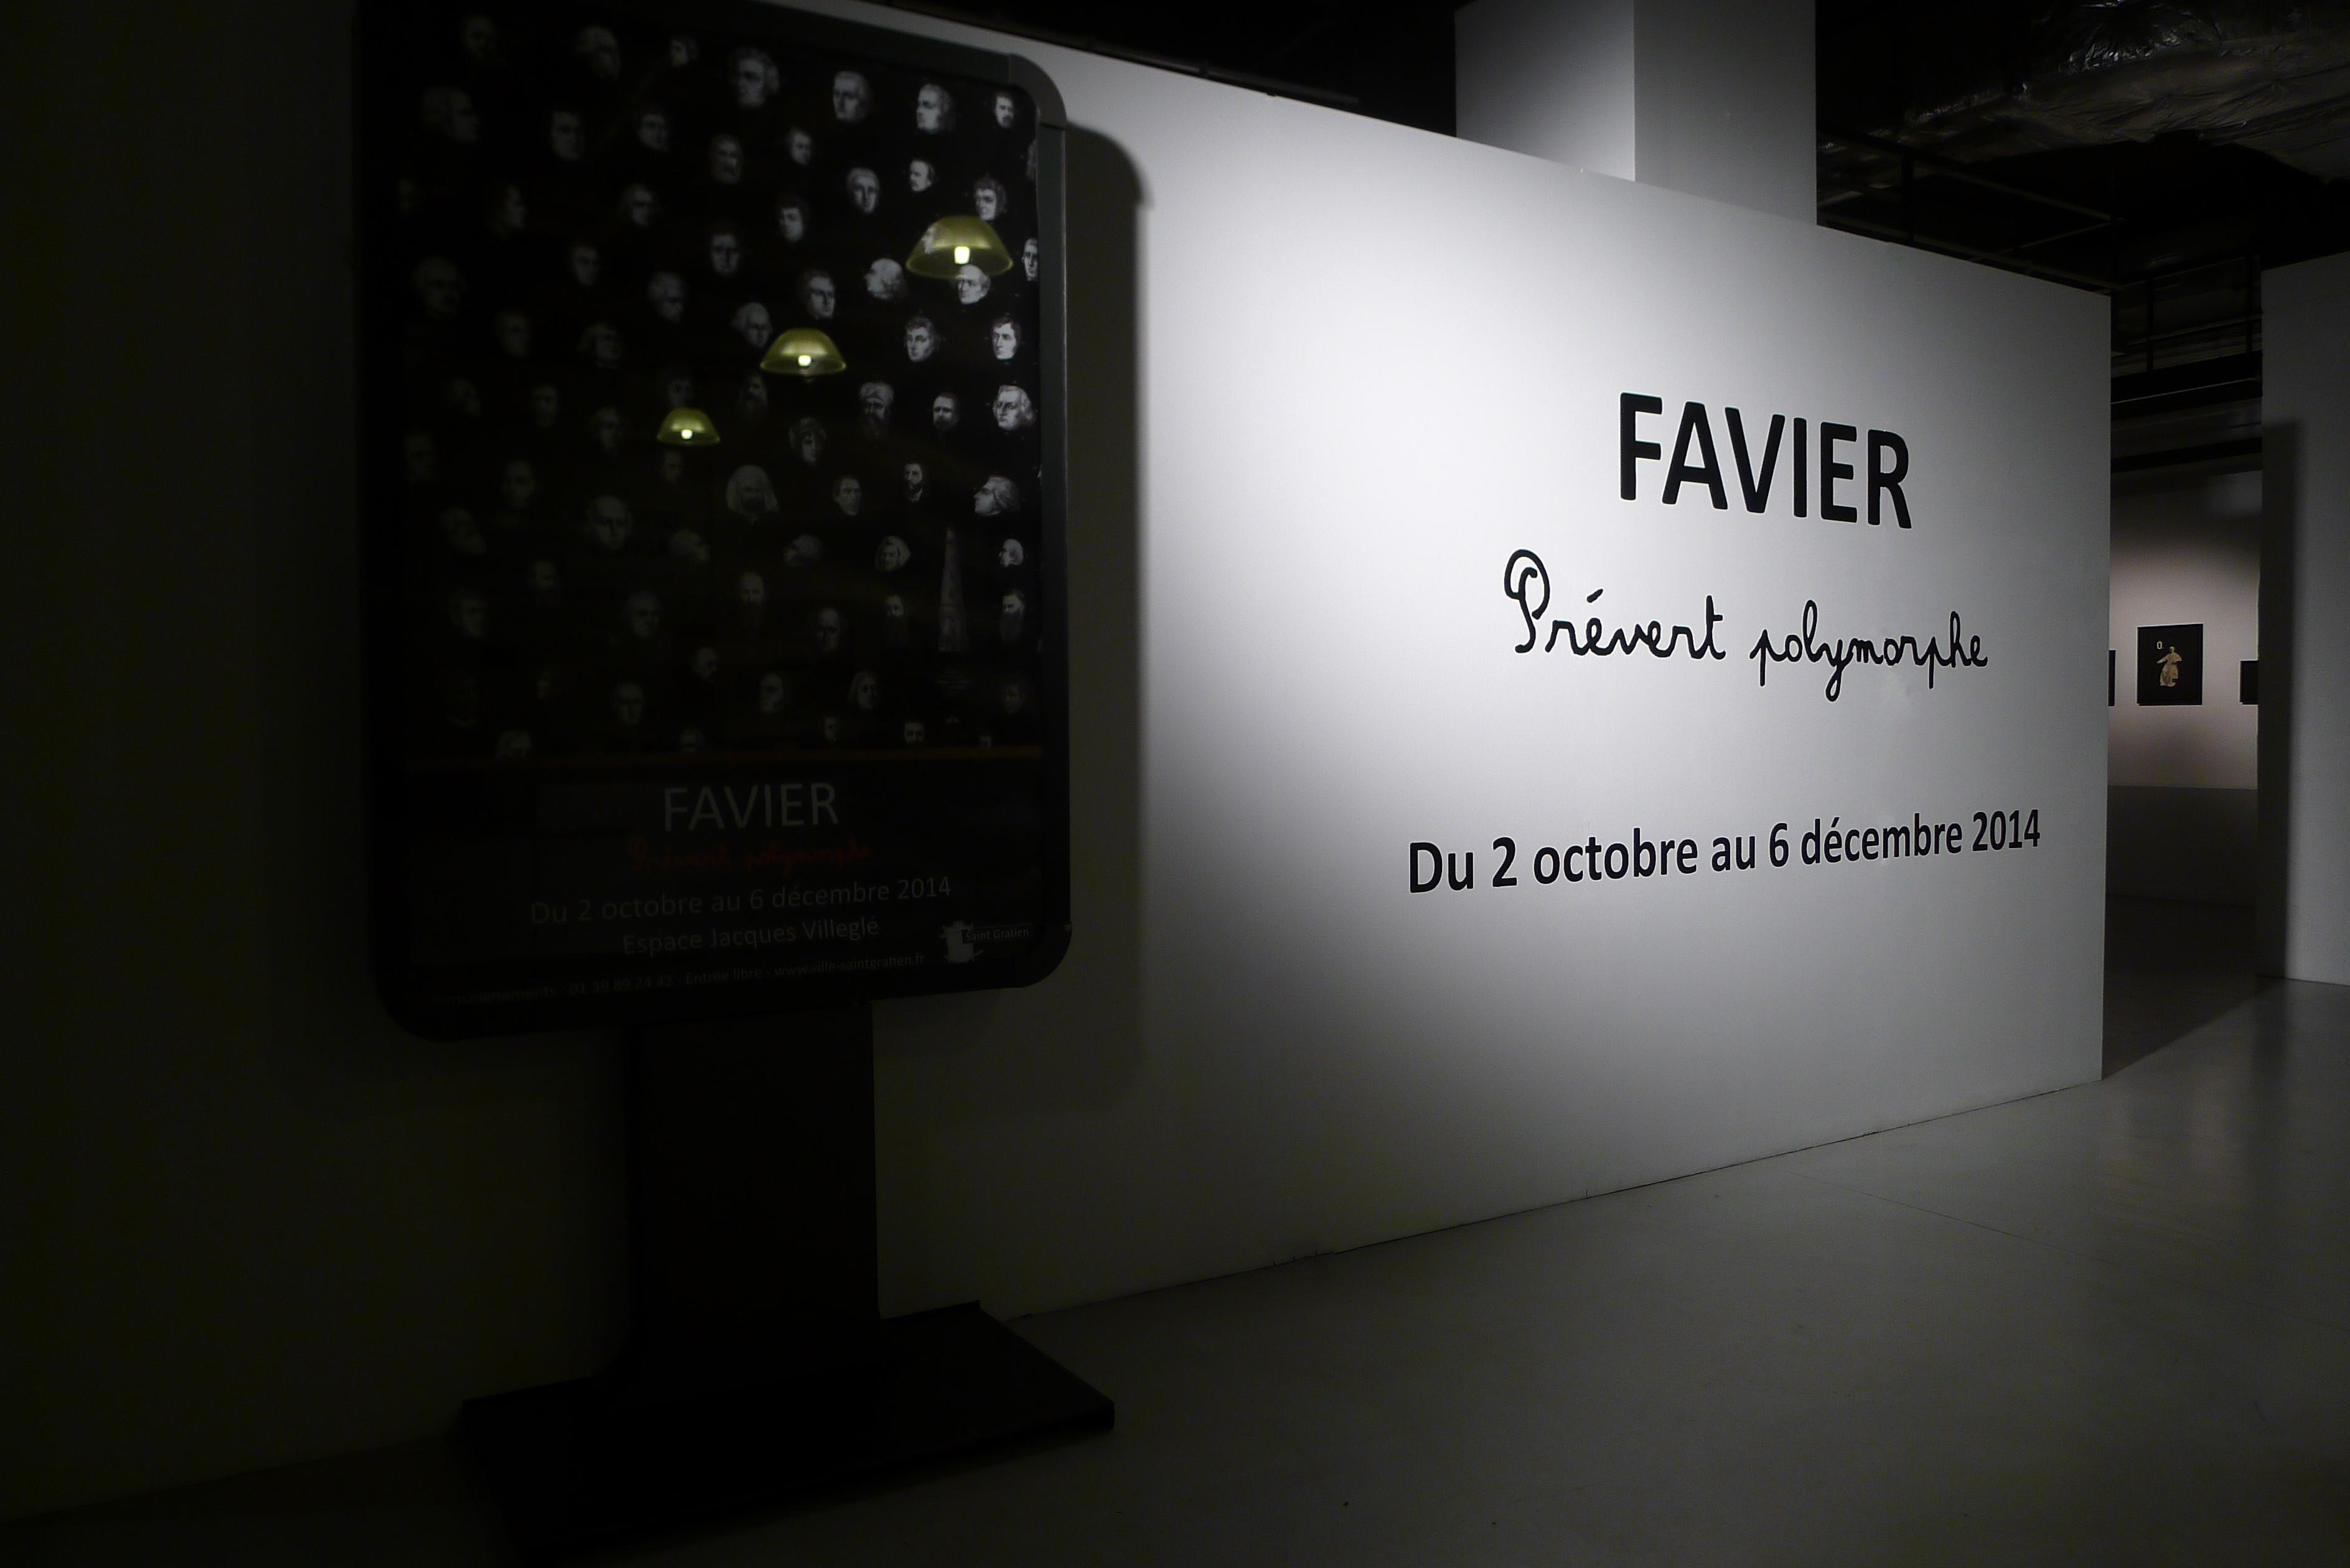 favier_p1210456.jpg